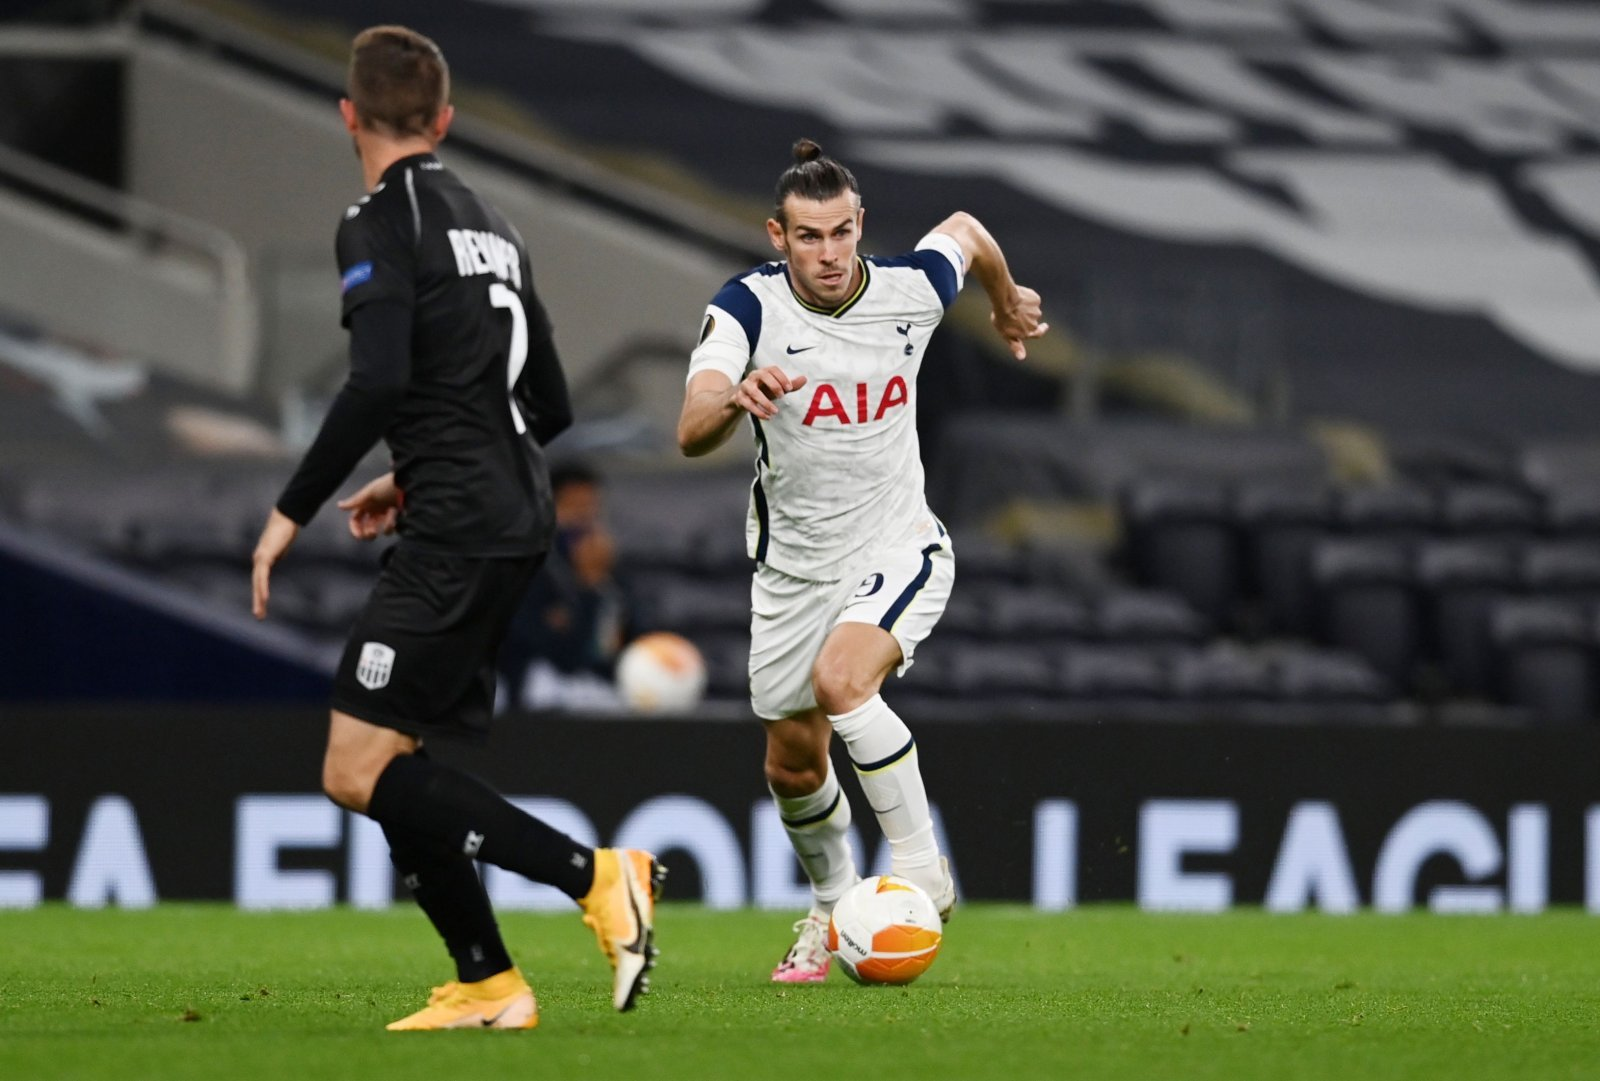 Tottenham Hotspur Glenn Hoddle Issues Bale Claim Ahead Of Chelsea Clash Thisisfutbol Com